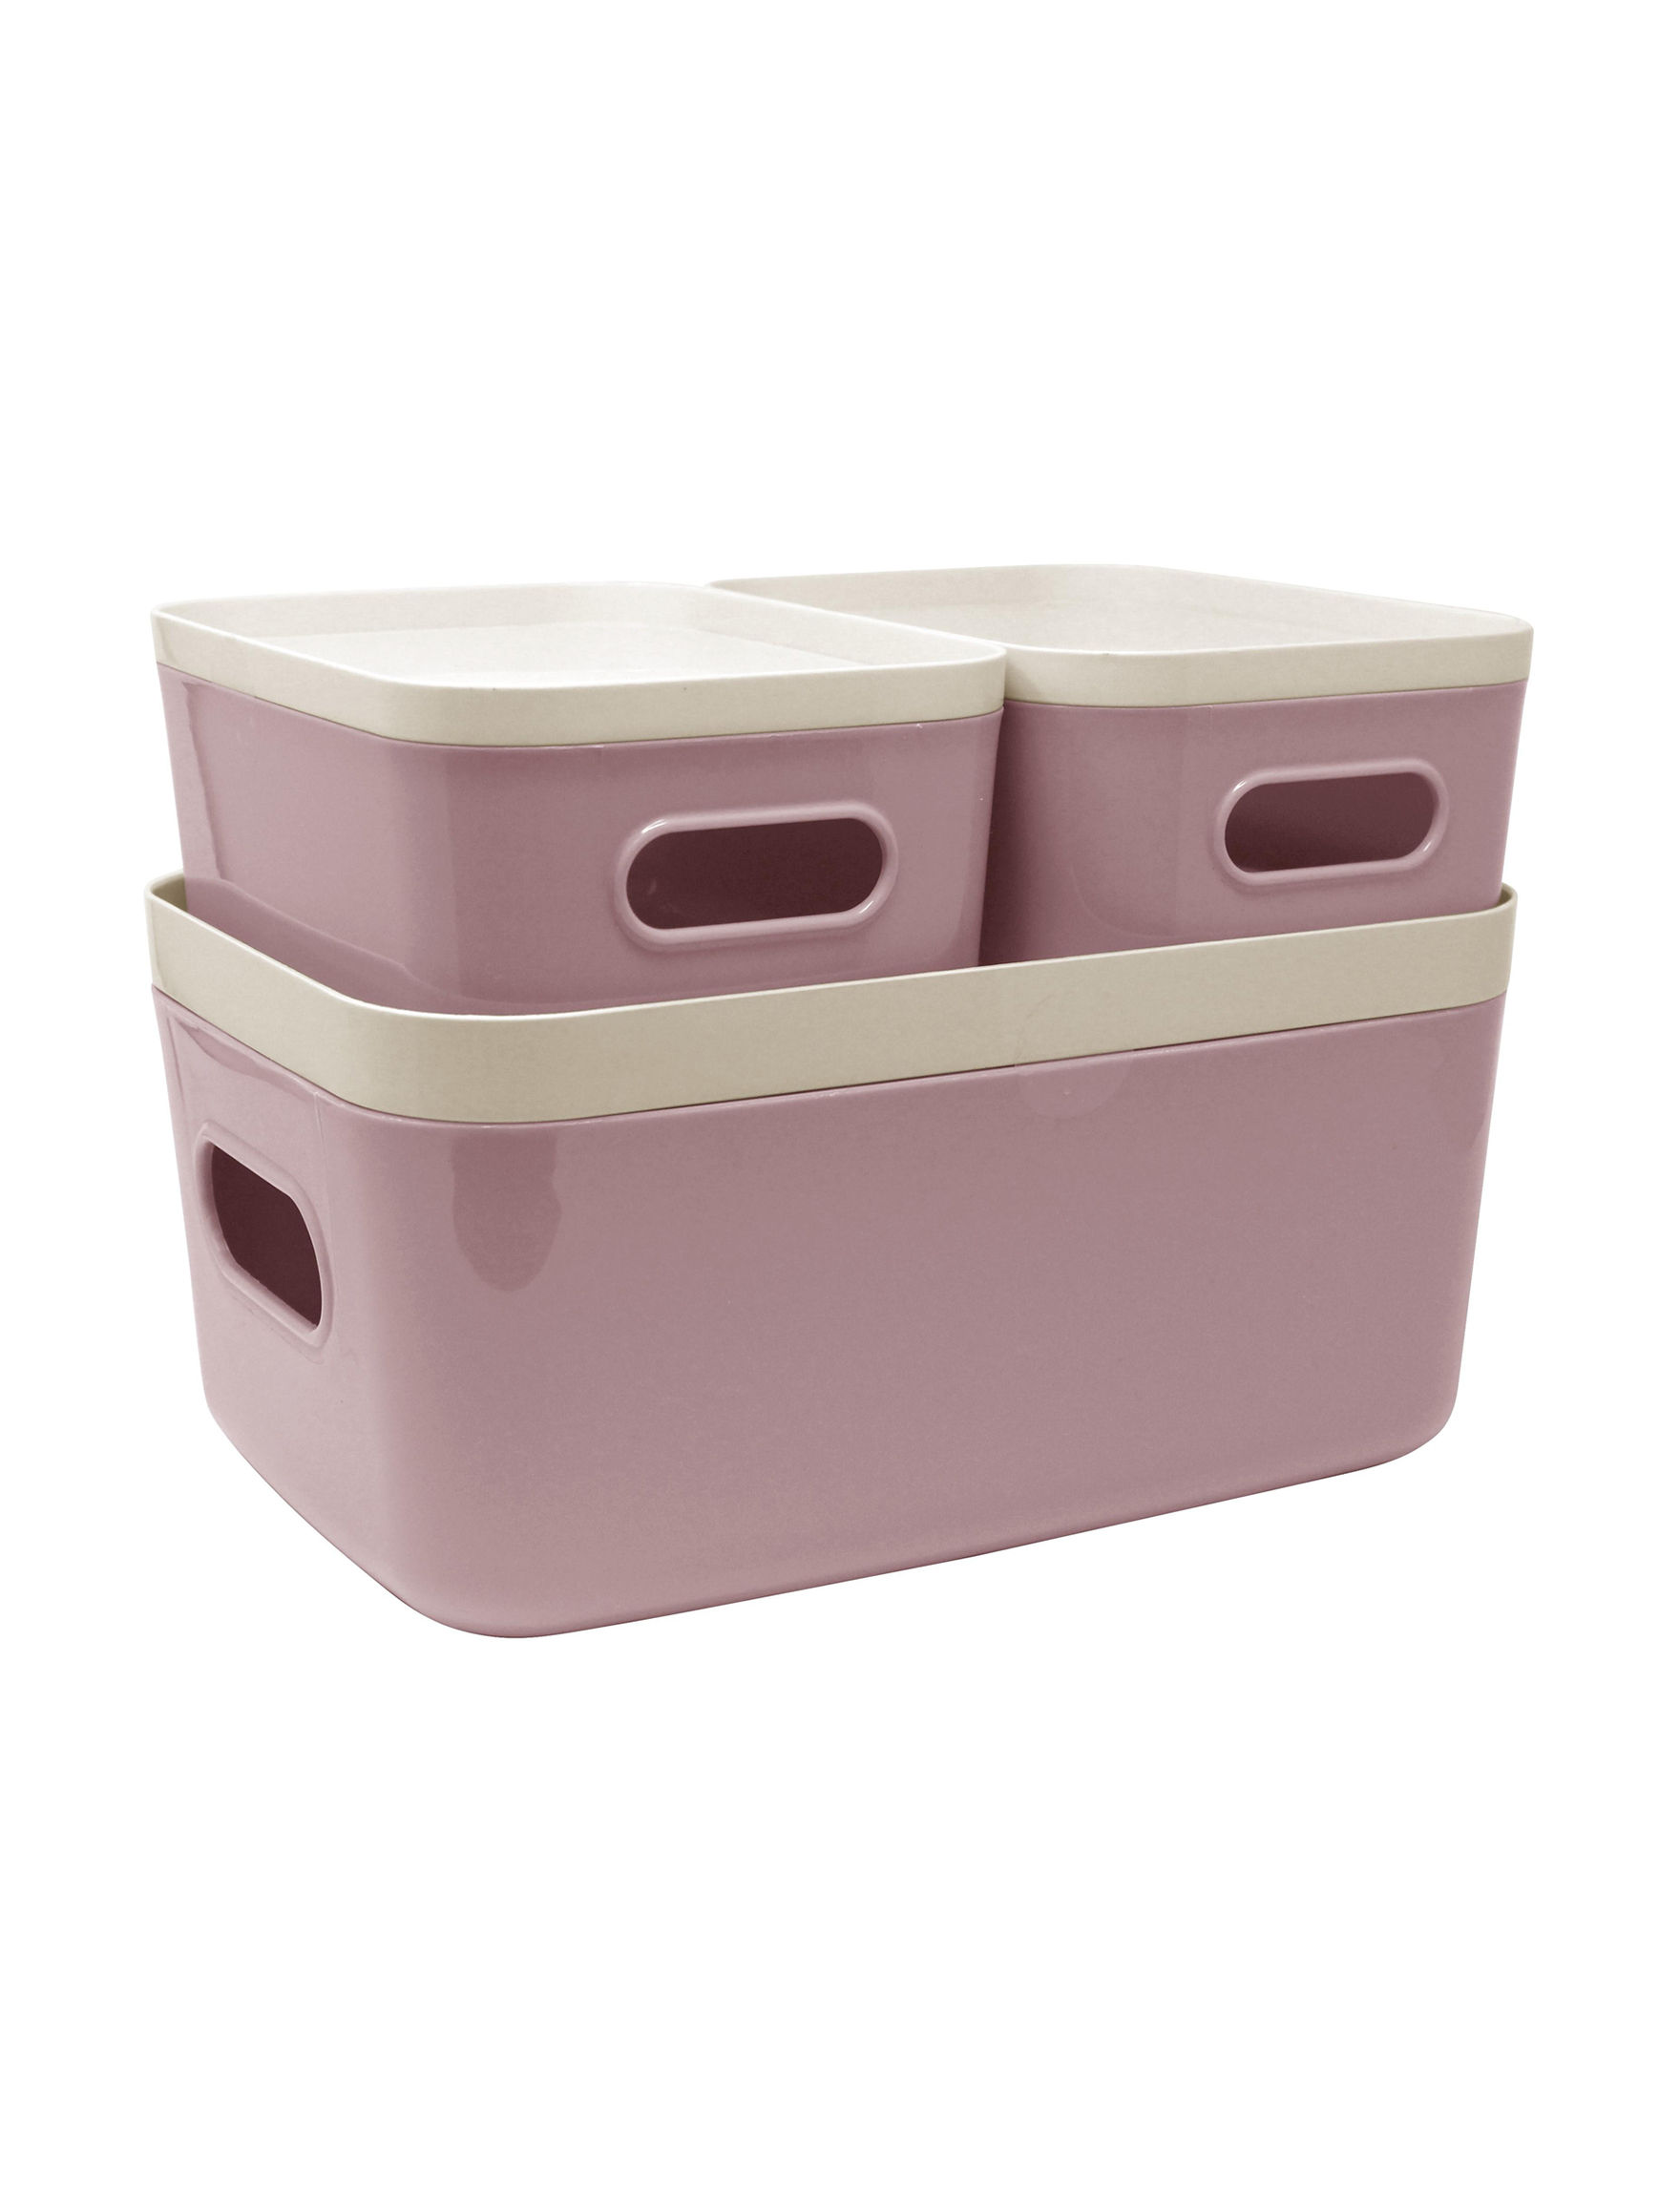 Gourmet Home Pink / White Storage Bags & Boxes Storage & Organization